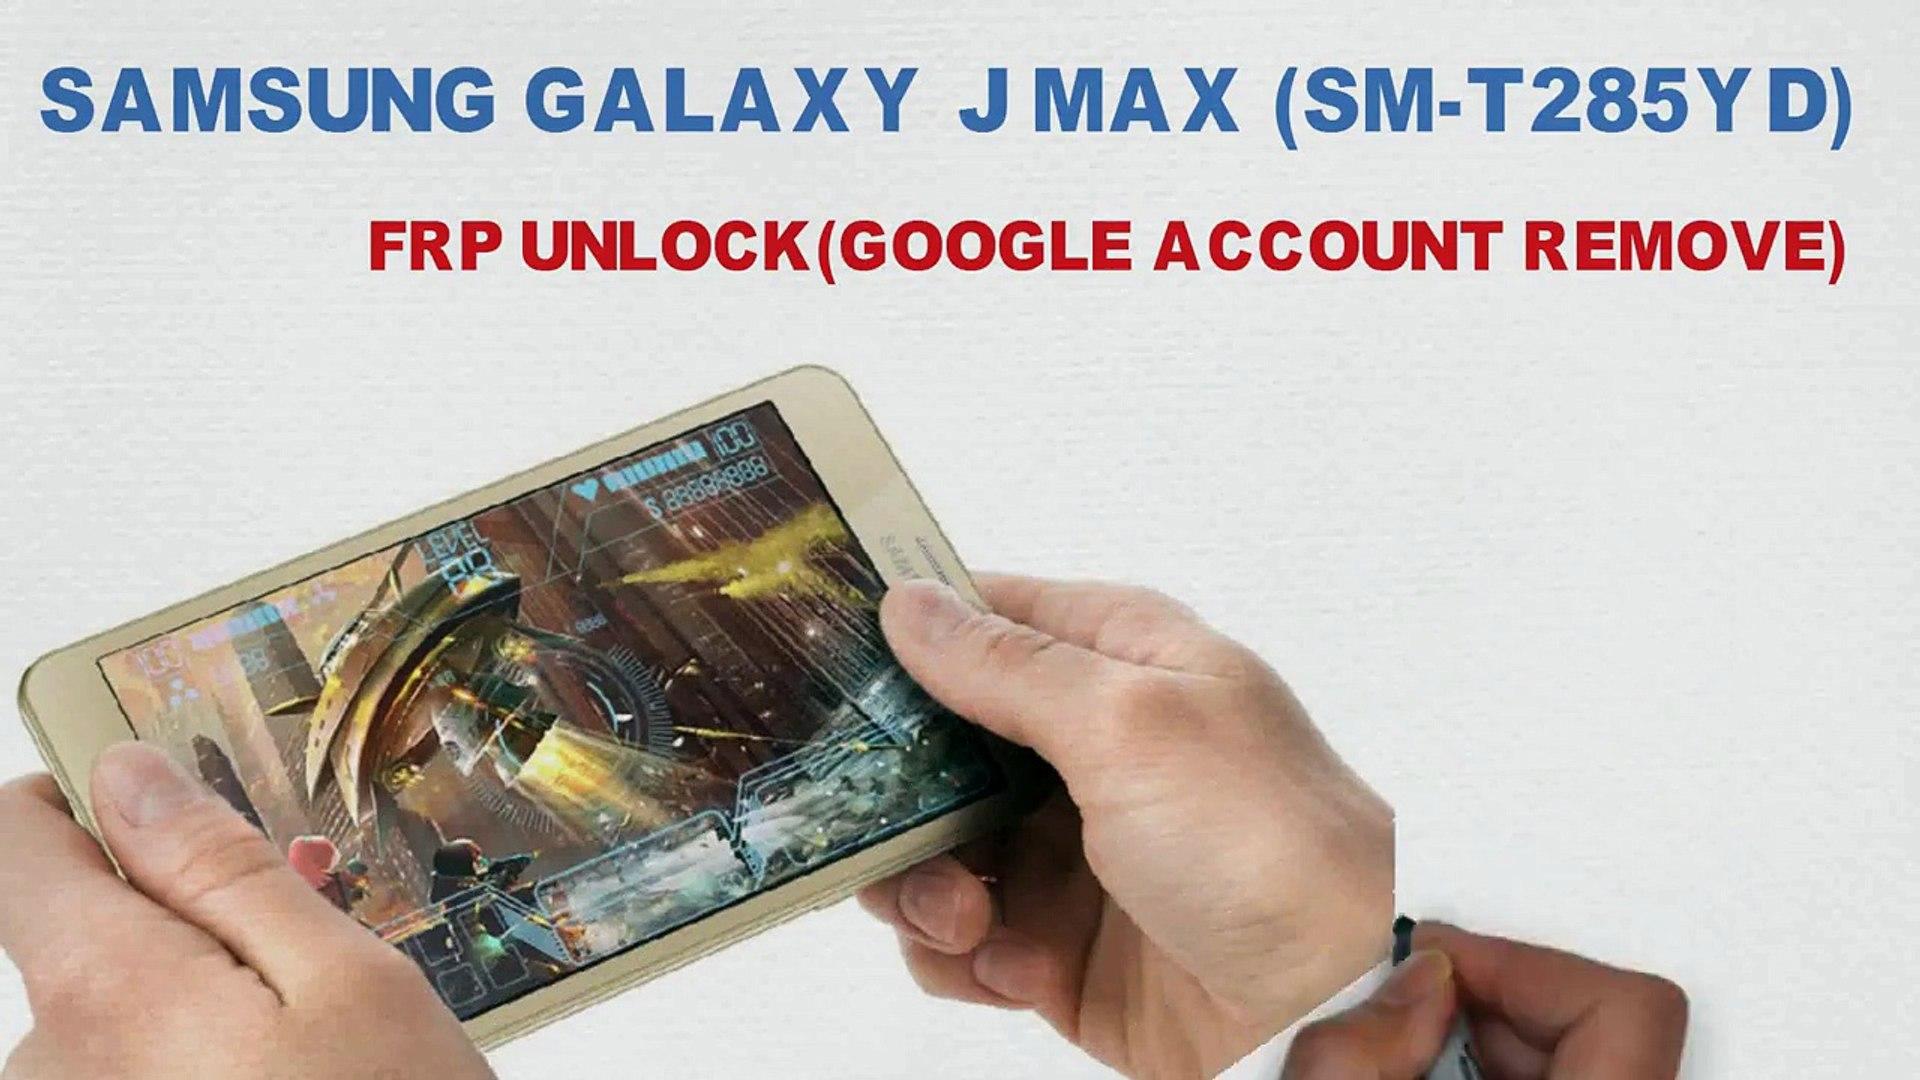 Samsung galaxy j max sm-t285yd frp unlock